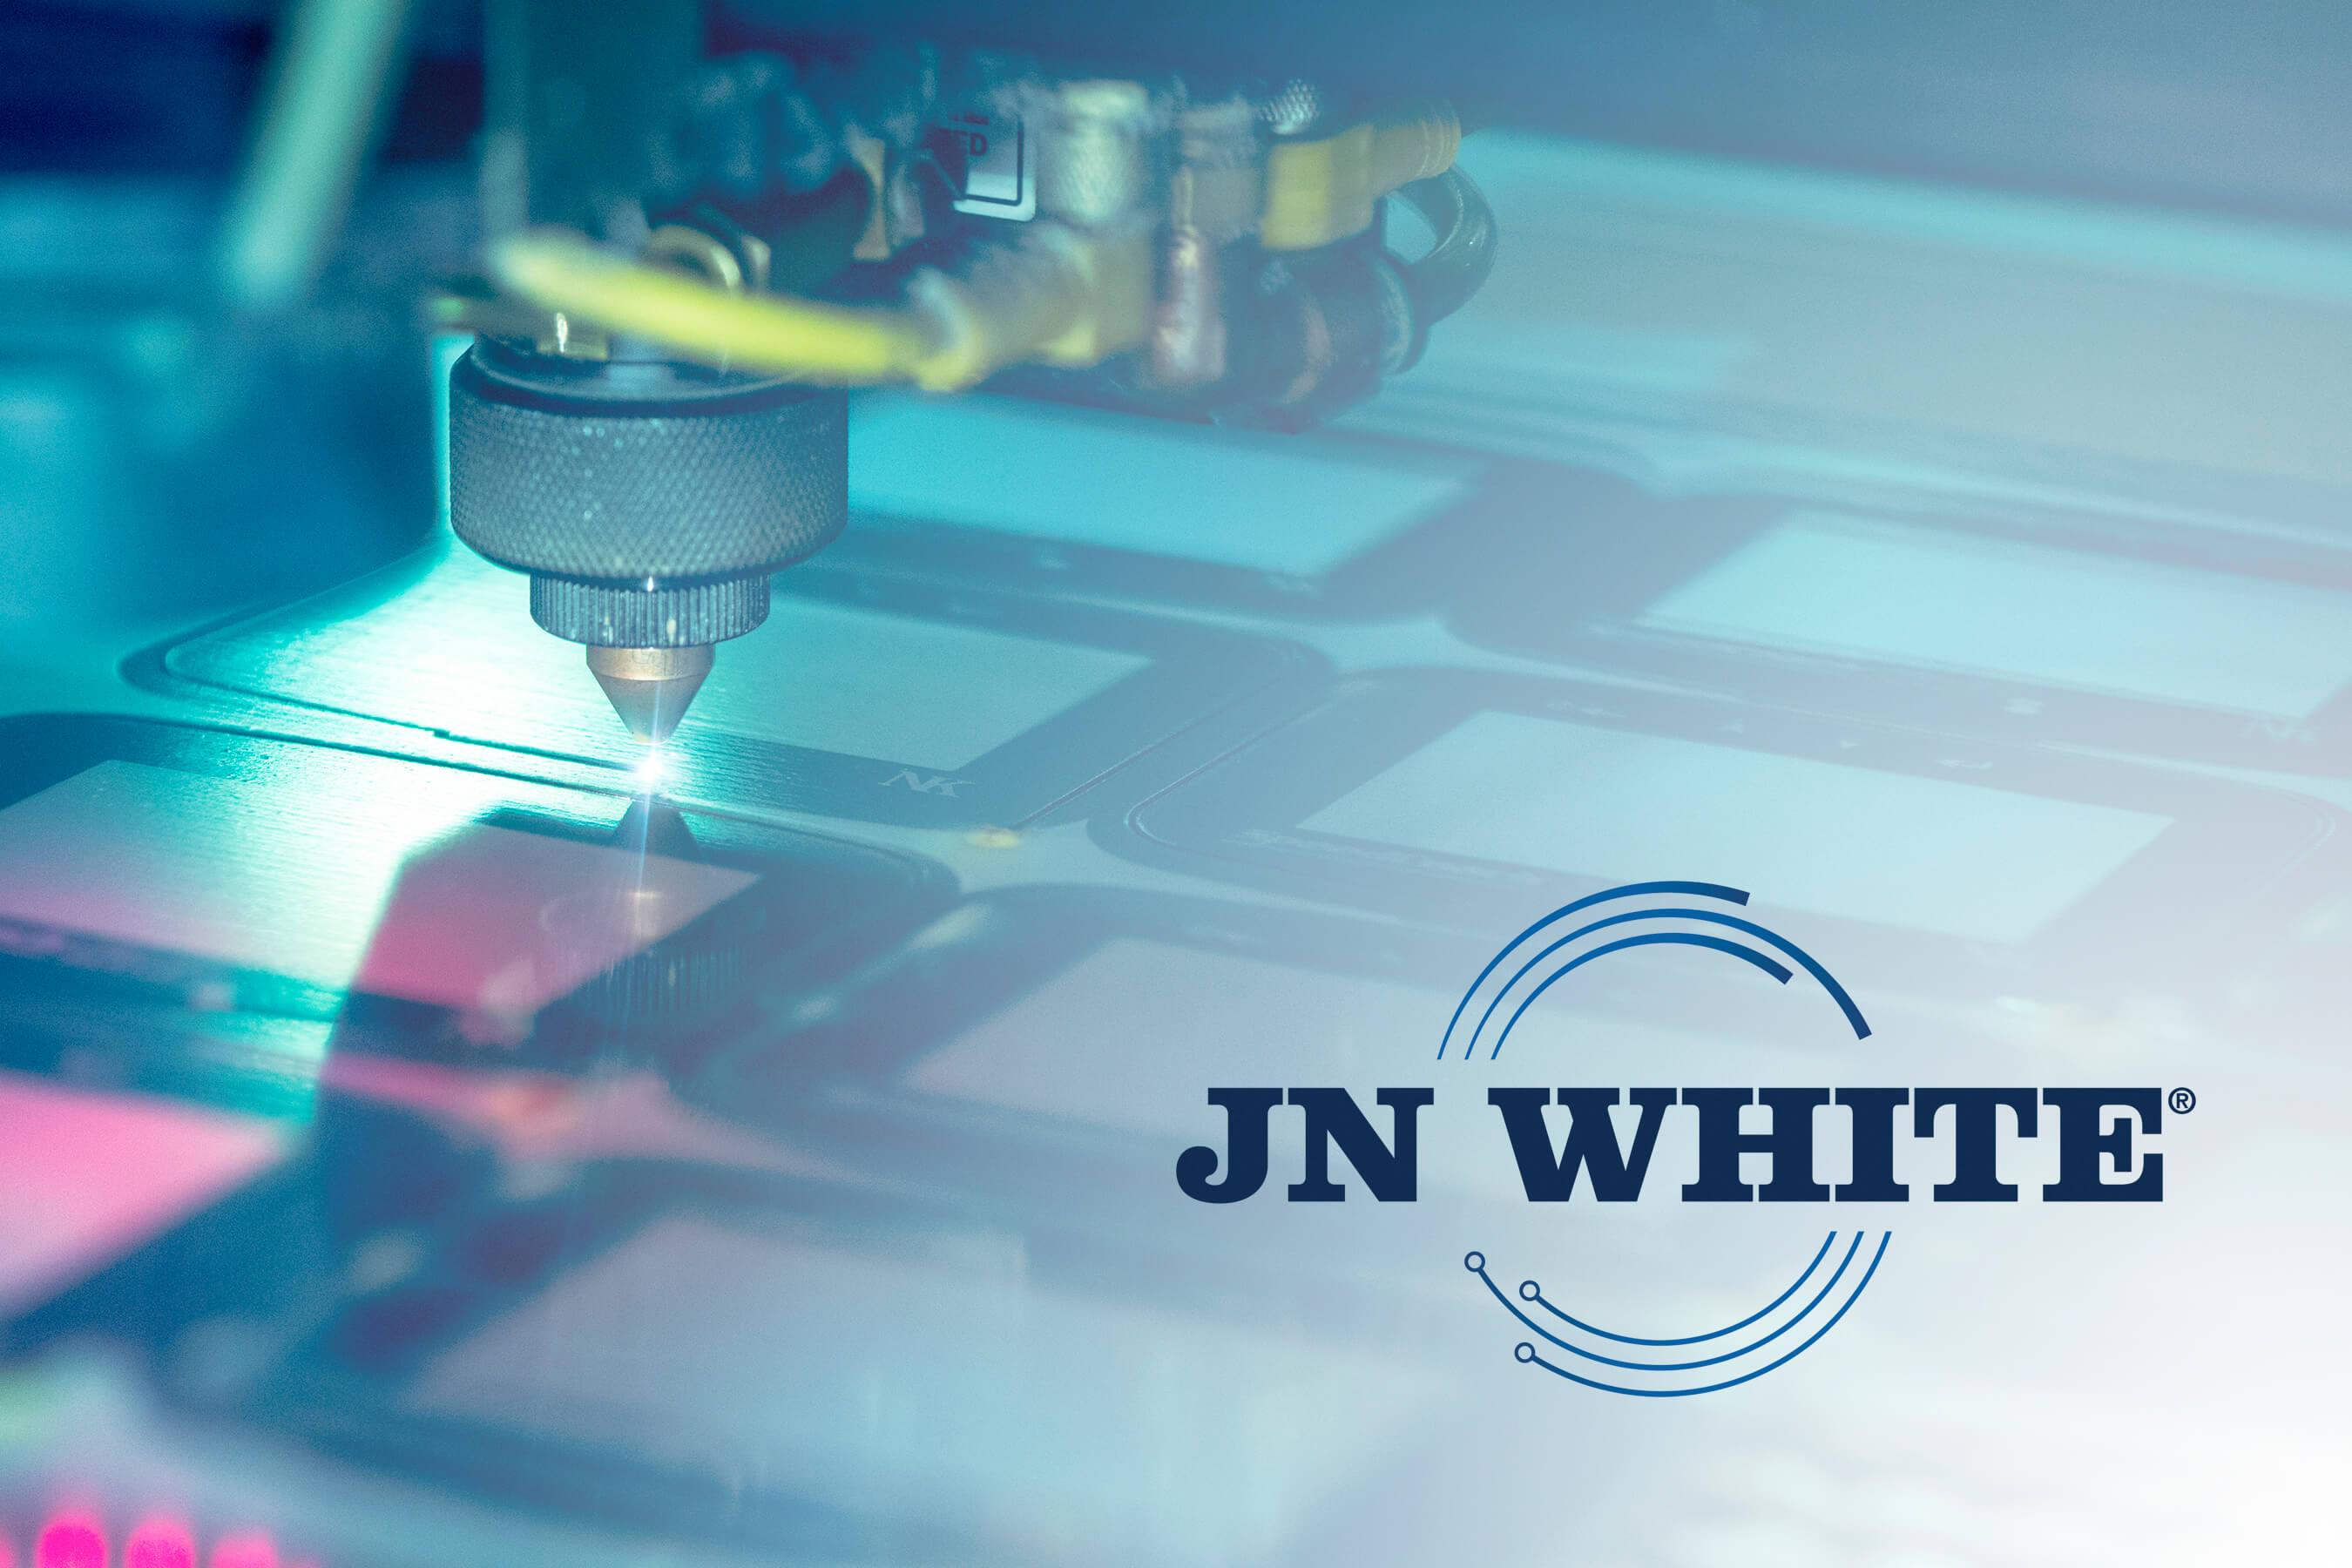 JN White® Named Finalist for the 2019 ETHIE Award